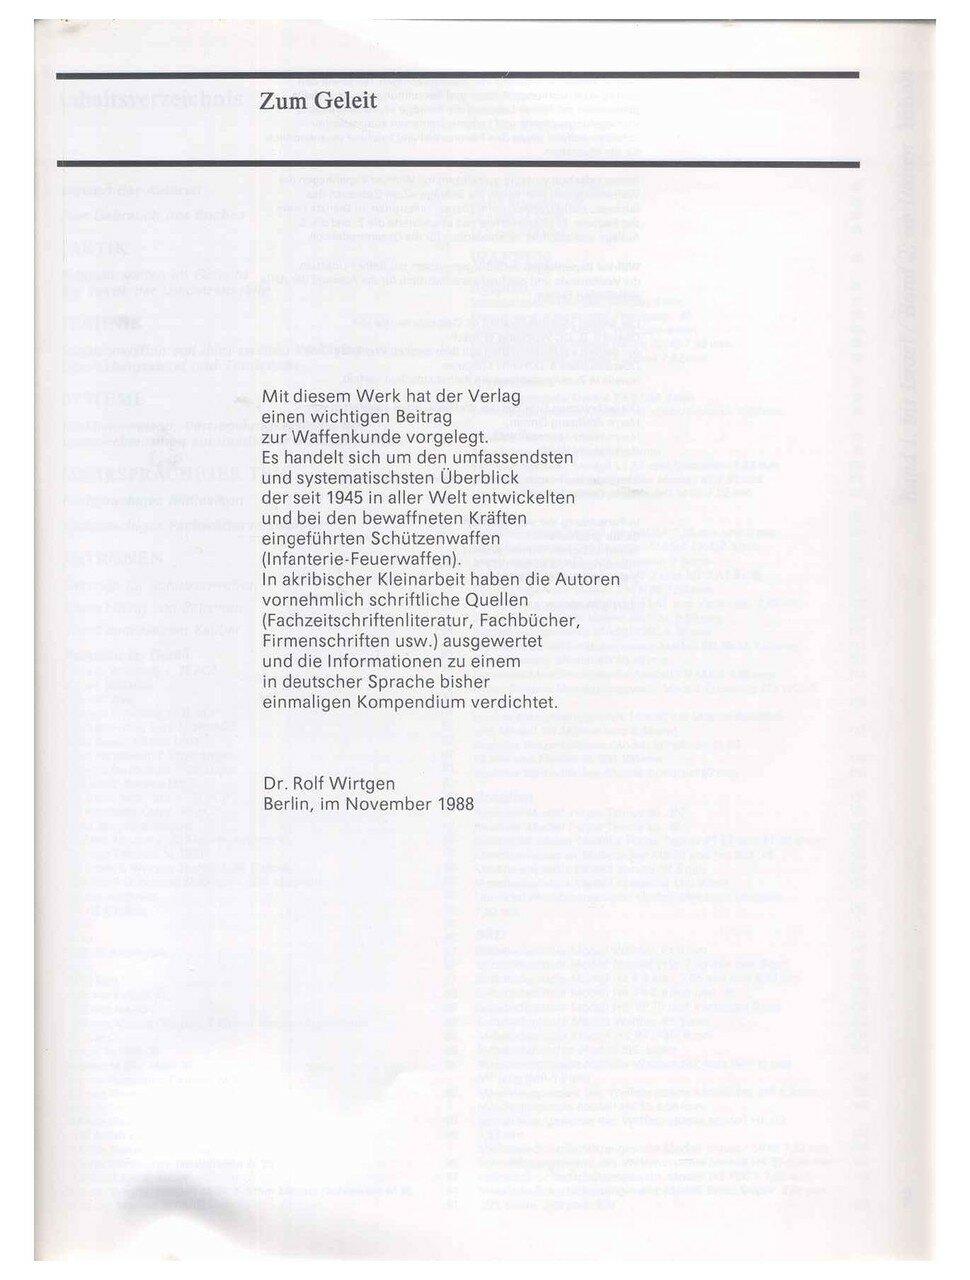 Schützenwaffen (1945-1985) Band 1 , BRD 1998: sassik